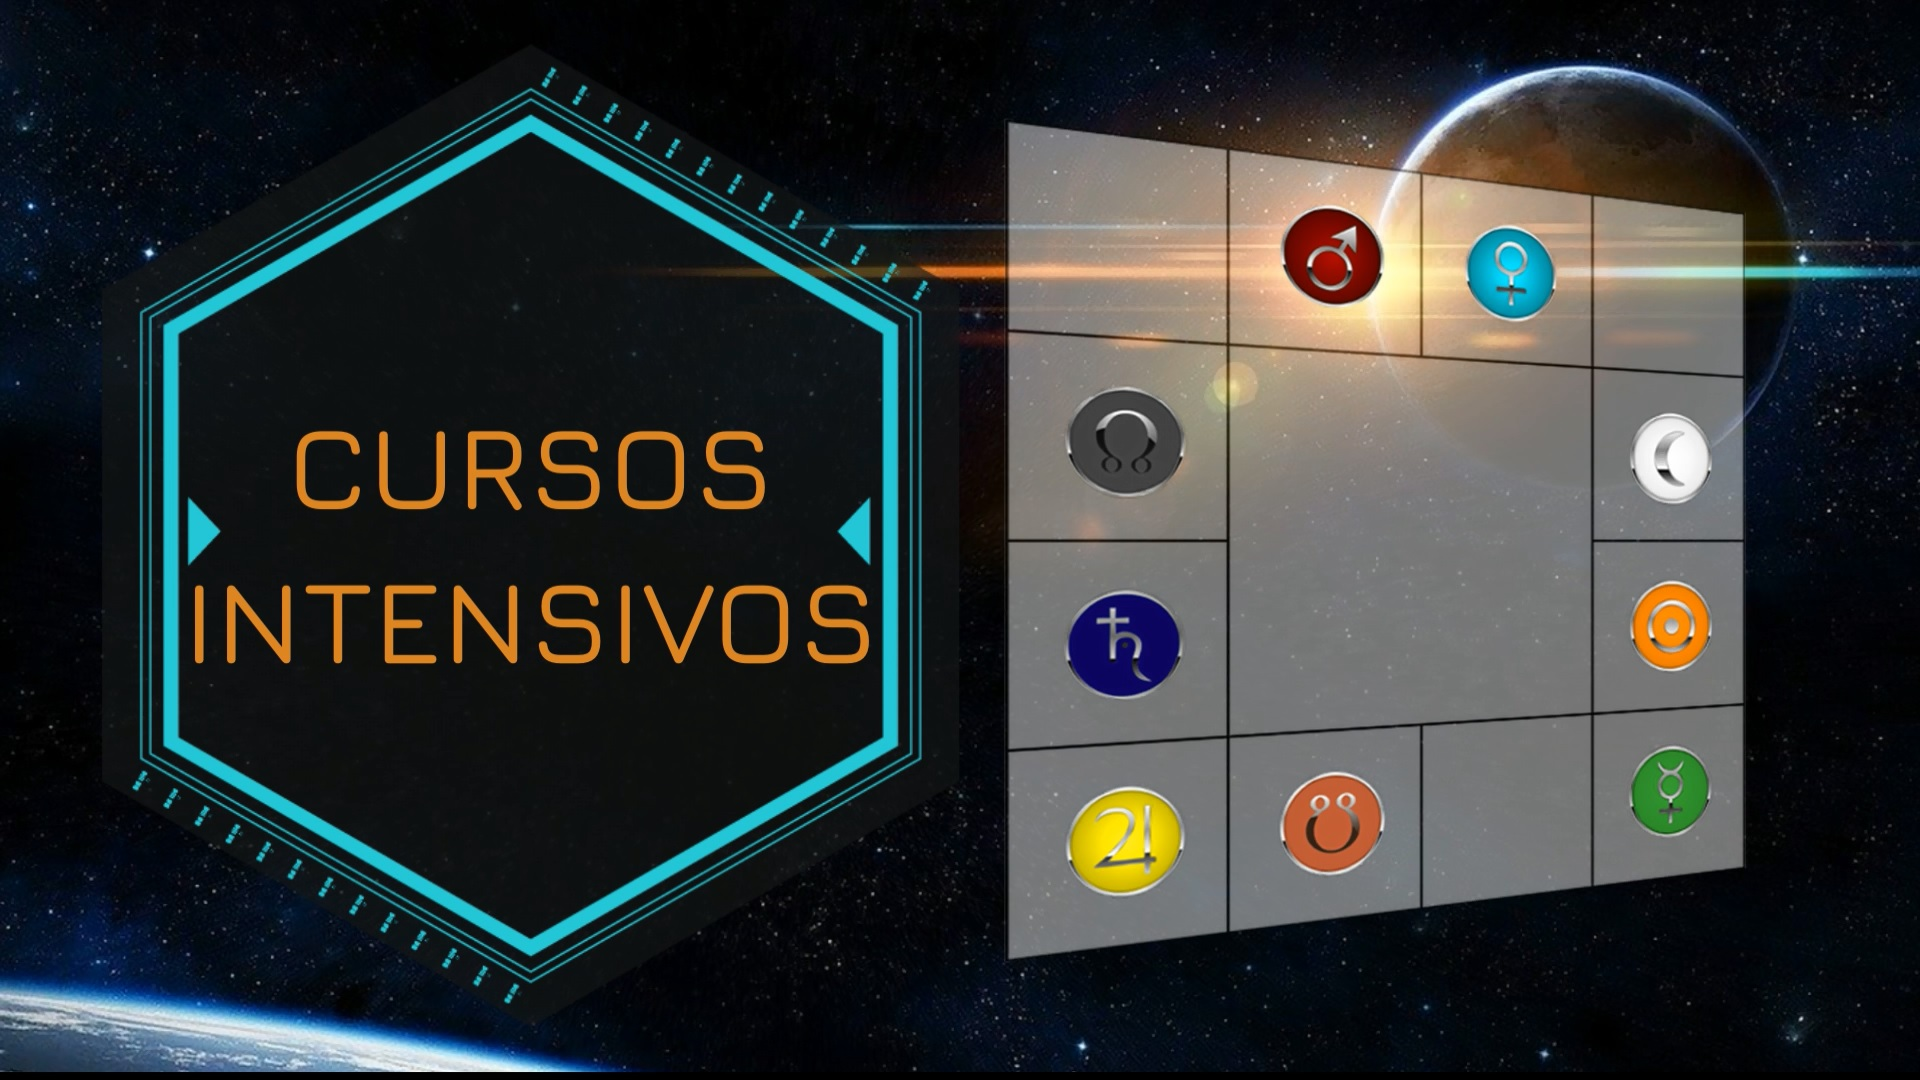 Cursos_Intensivos_Astrologia